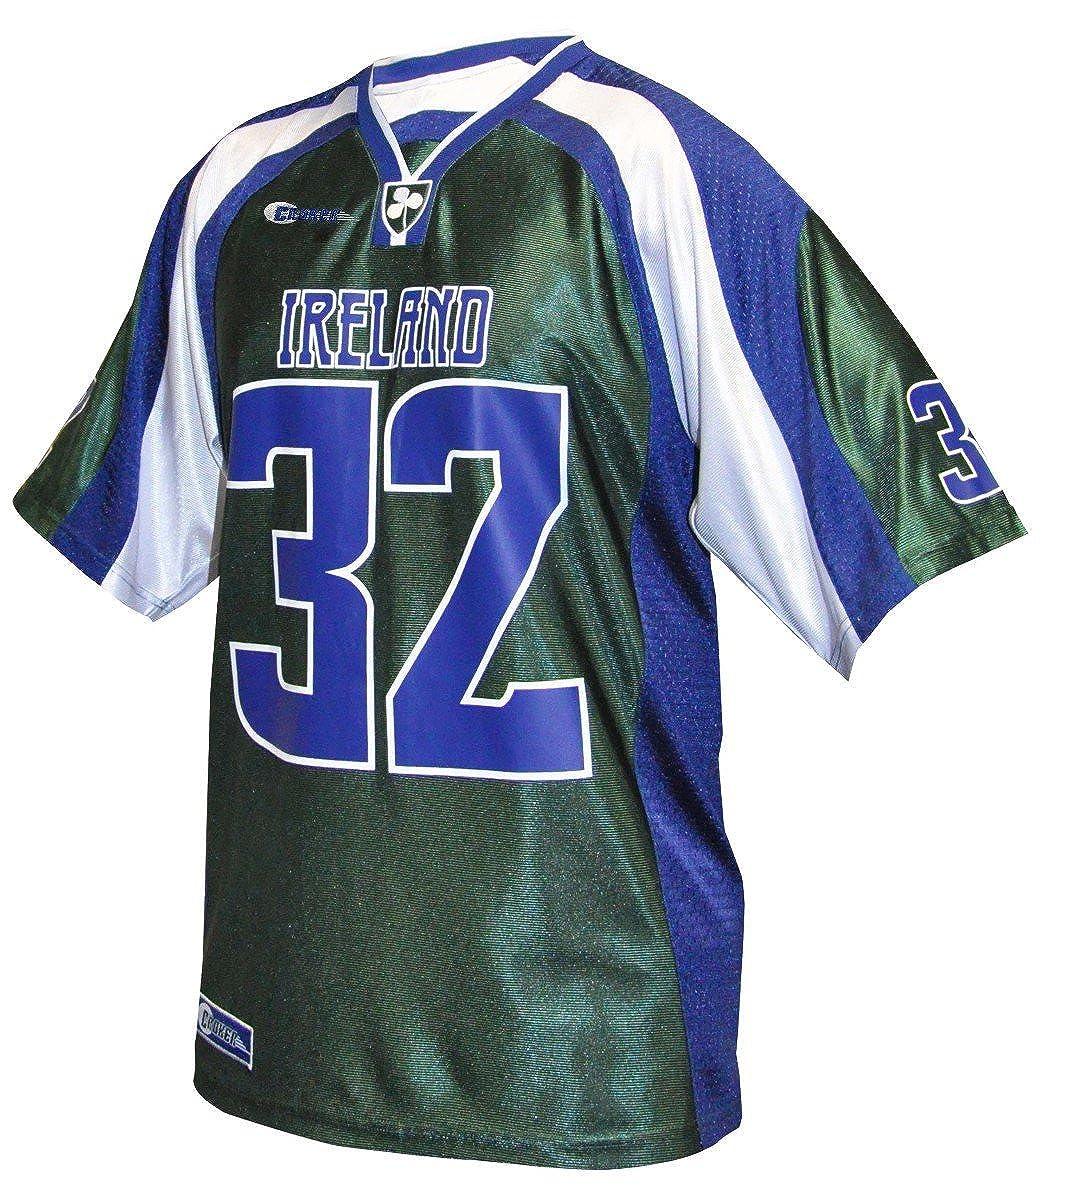 Croker clothing Irland American Football Jersey